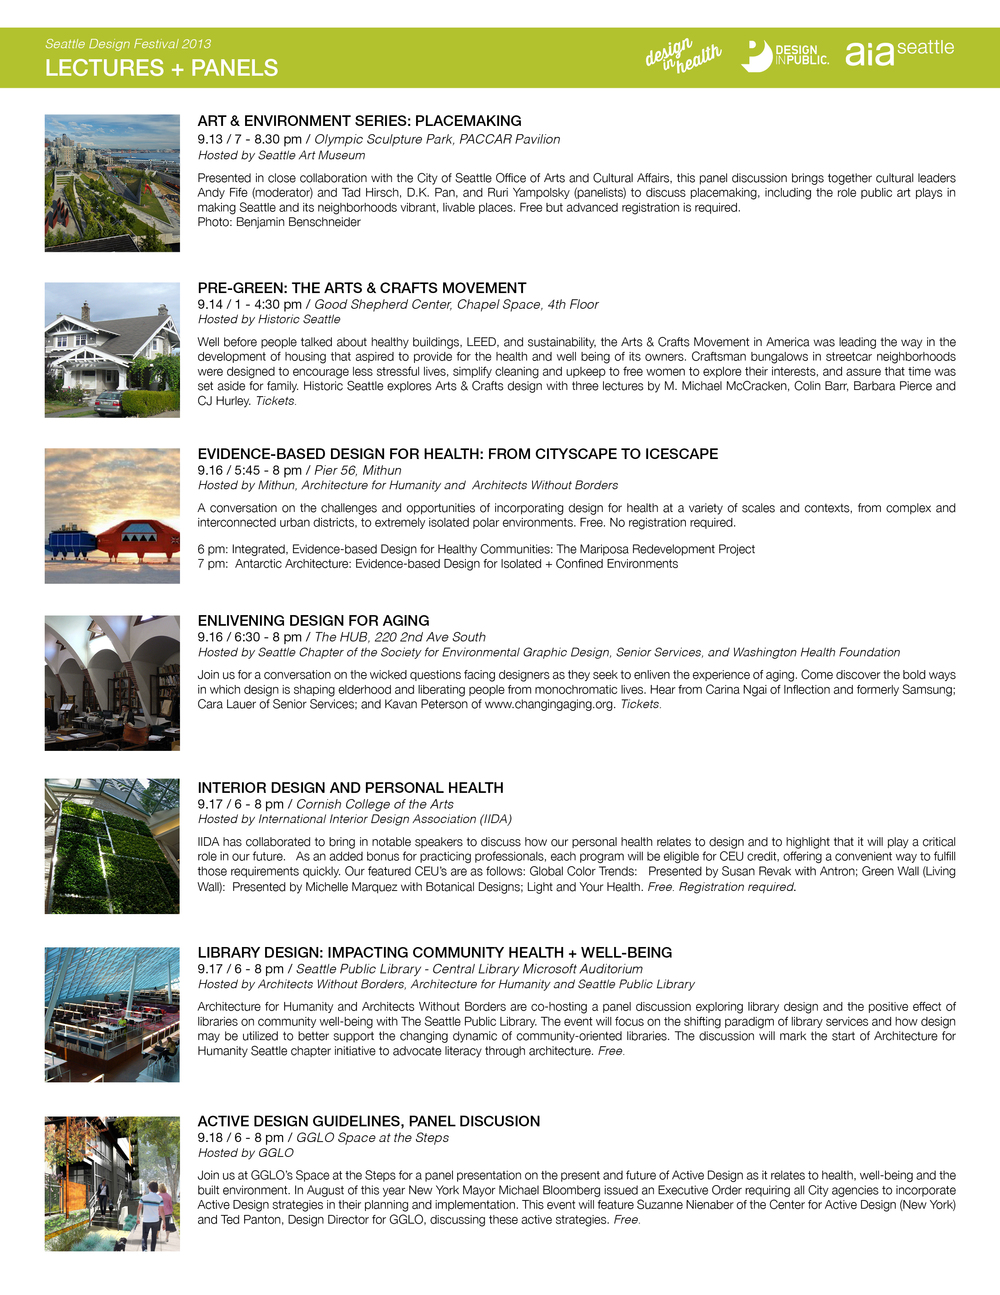 SDF13_festival program_of_events_web23.jpg